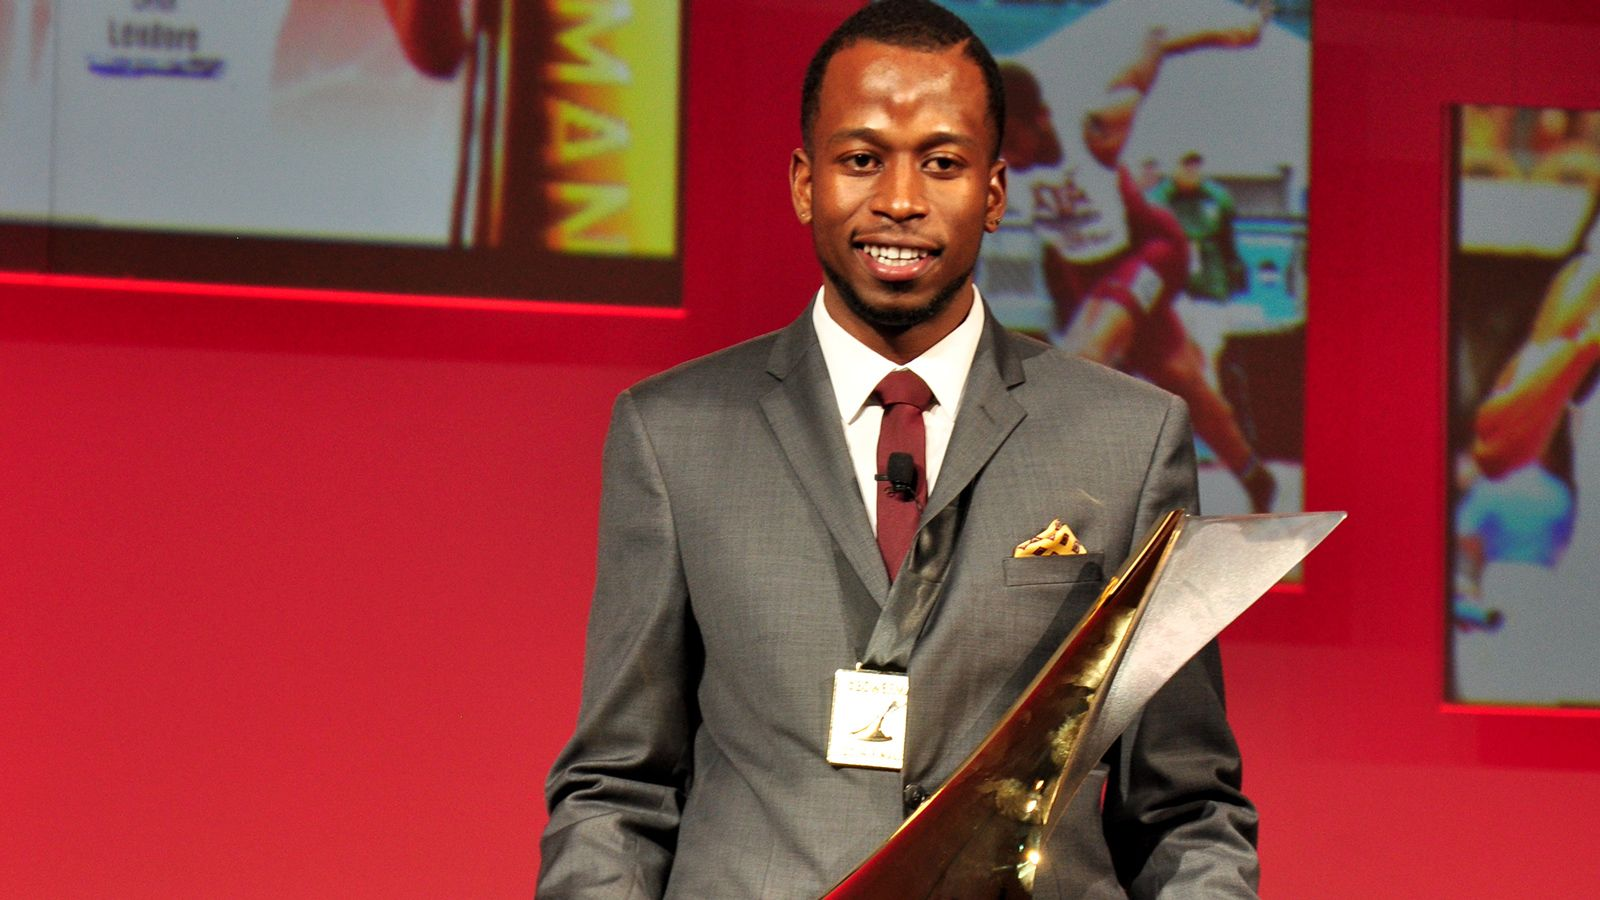 Aggie sprinter Deon Lendore wins the Bowerman Award